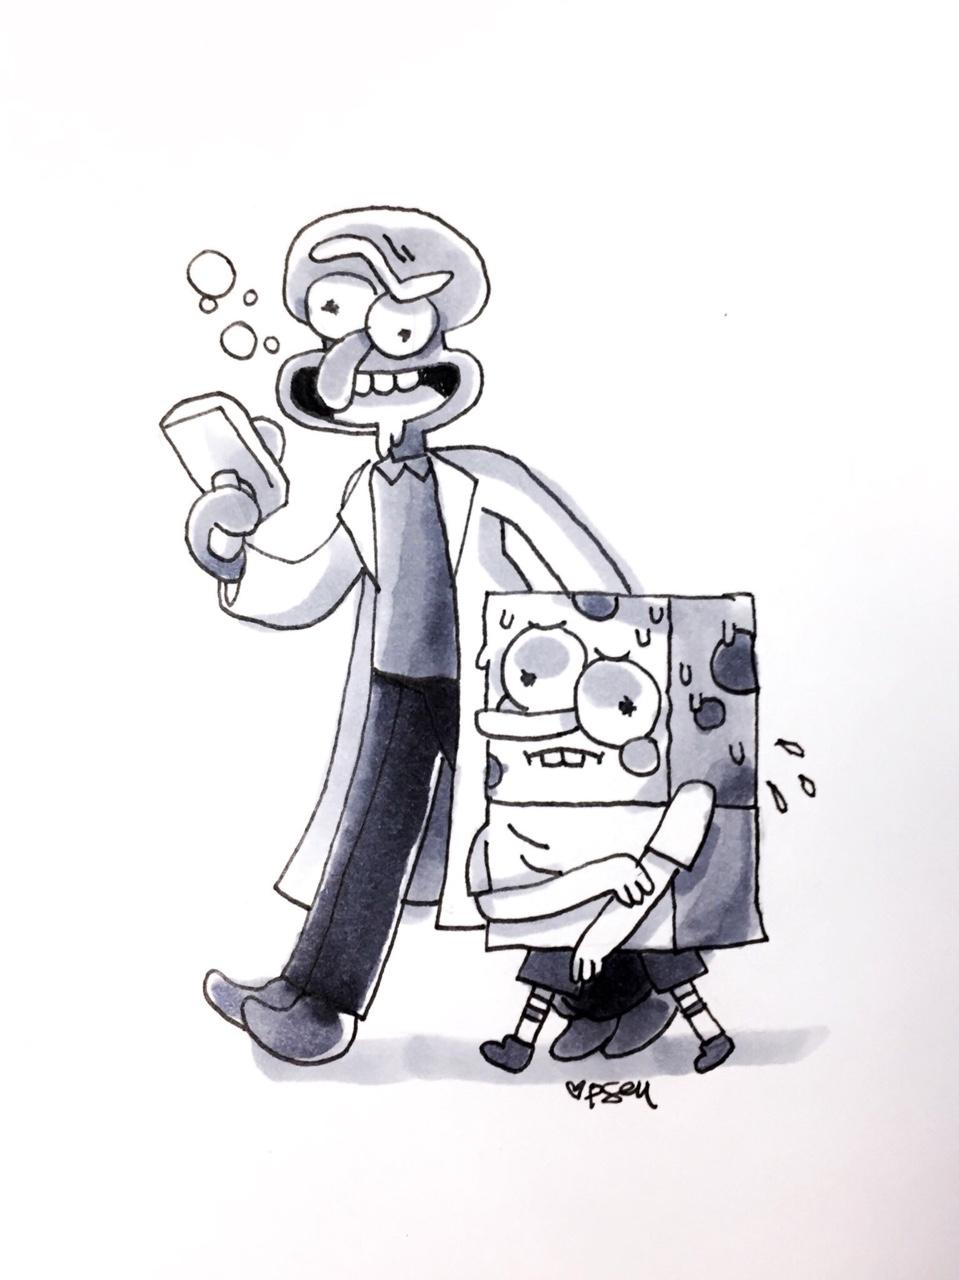 squidward and spongebob spongebob squarepants know your meme